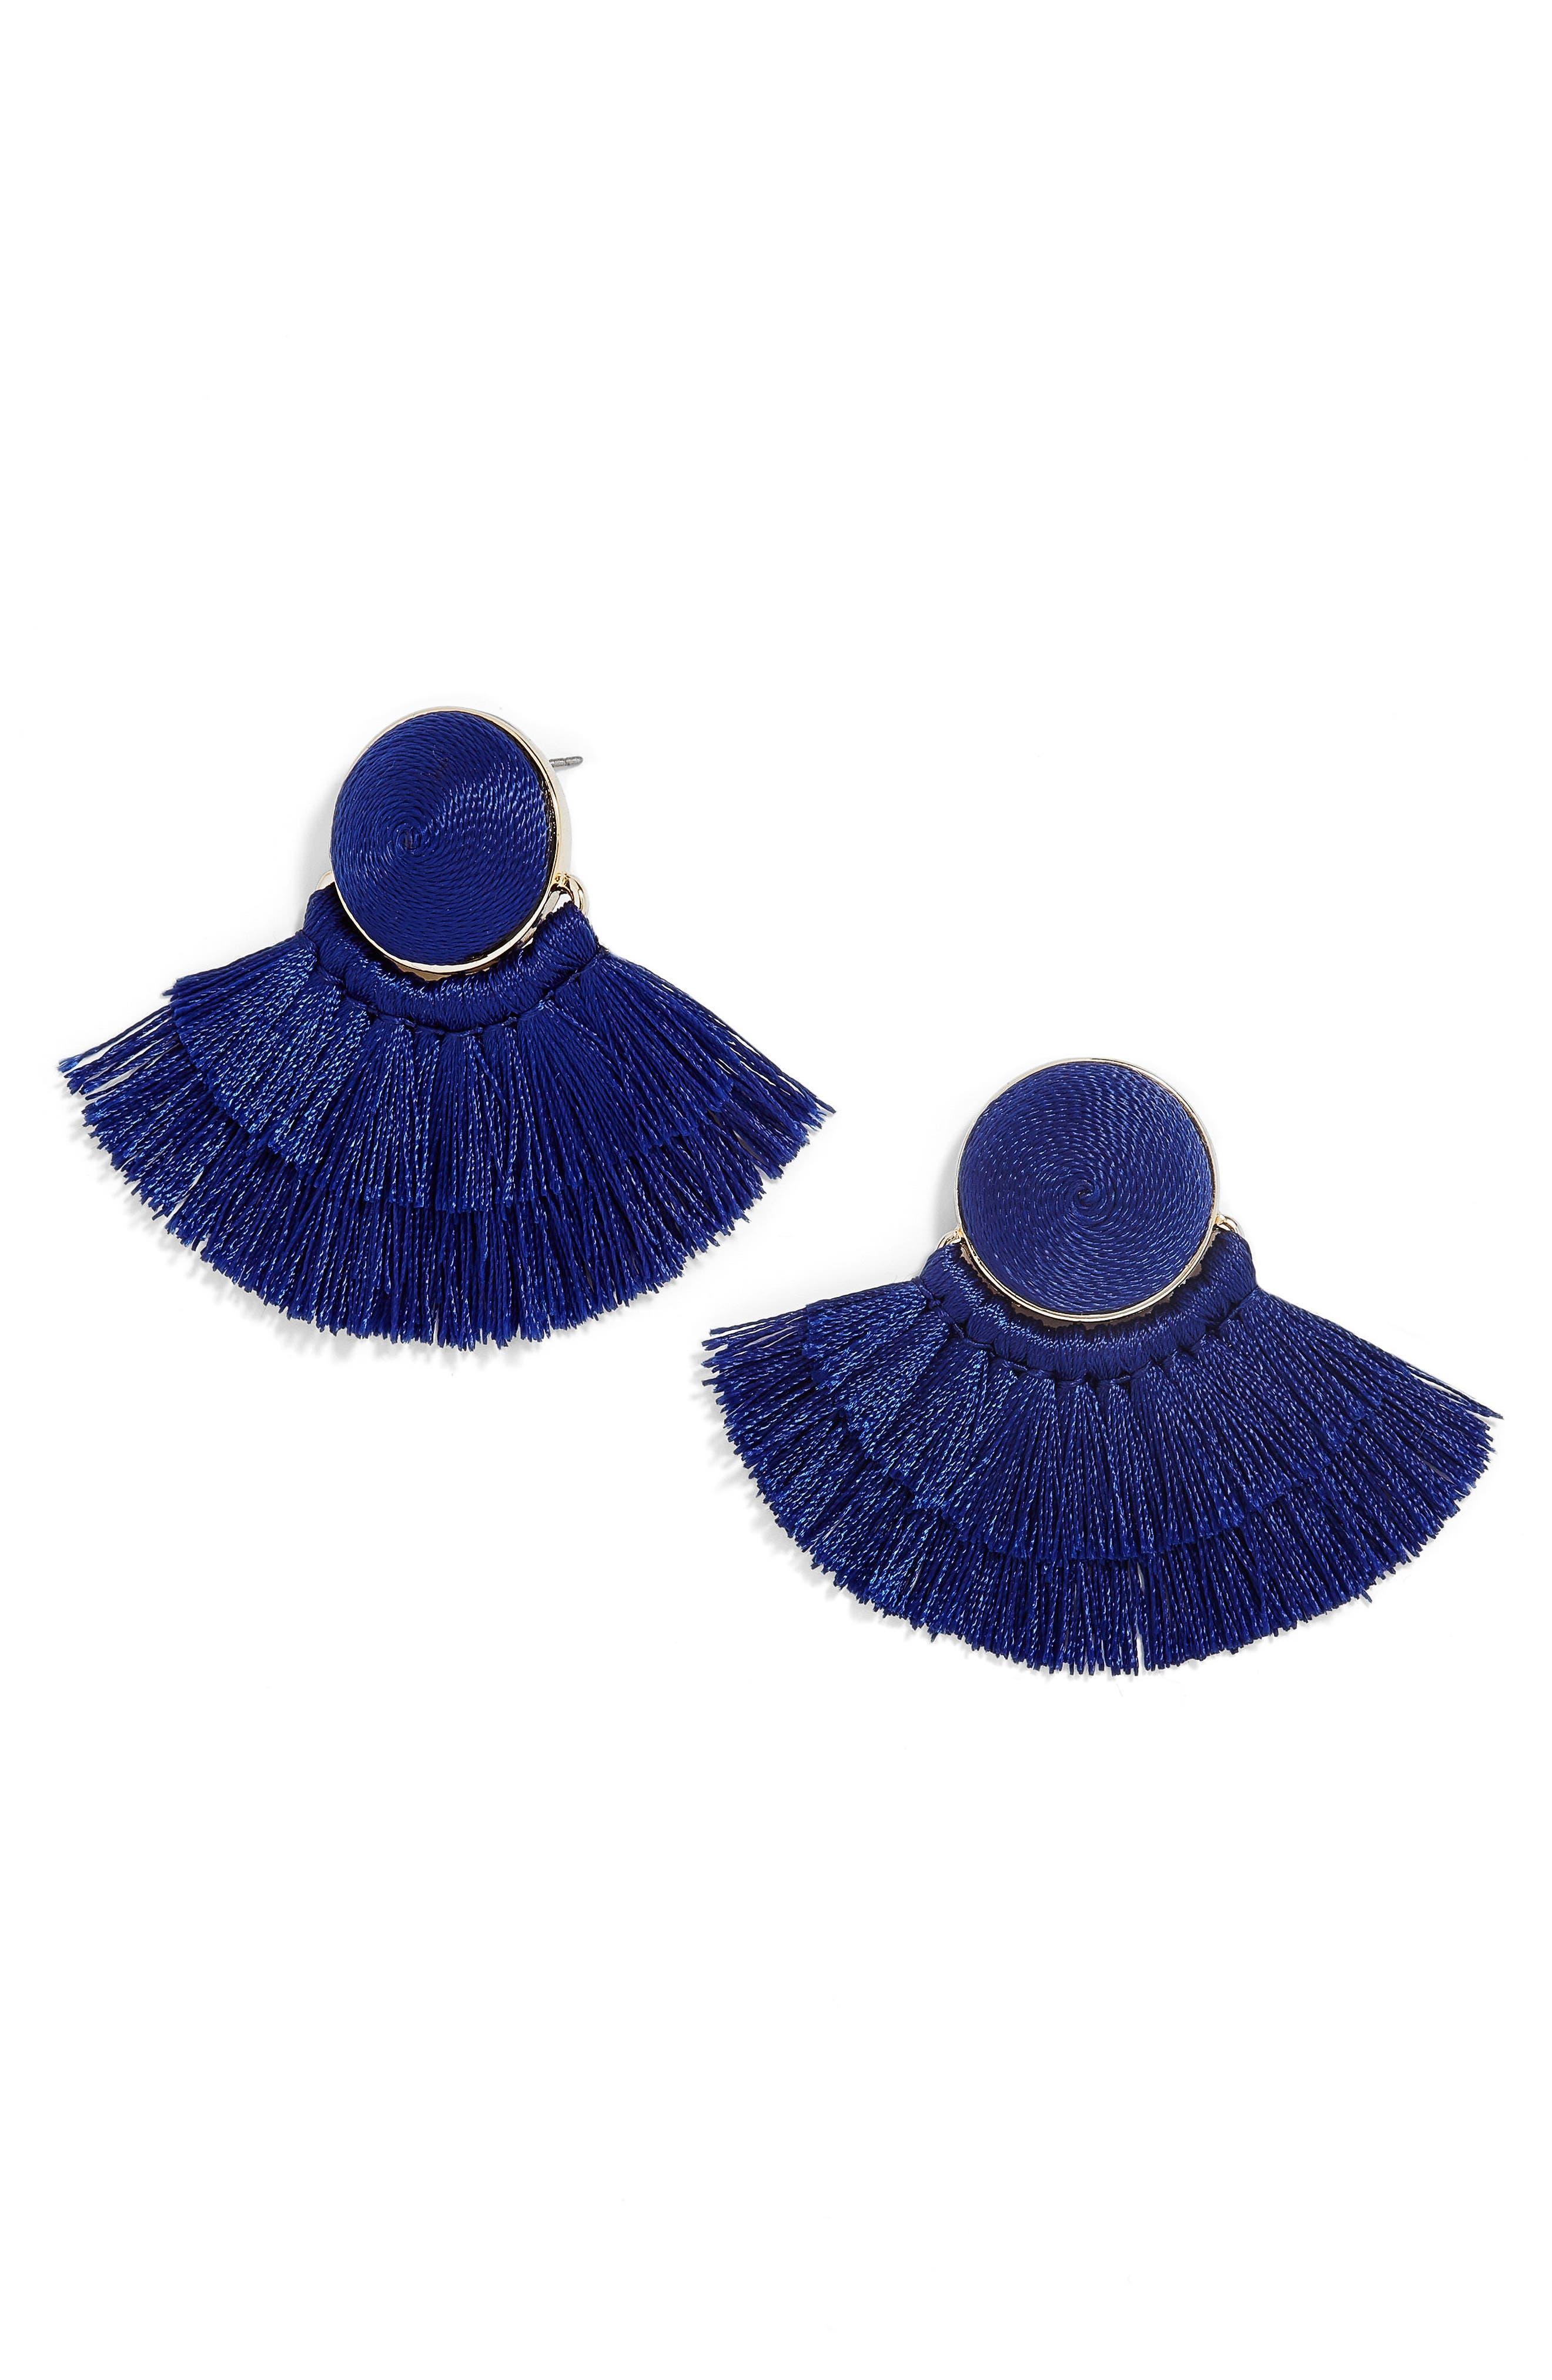 Martina Chubby Deco Fringe Drop Earrings,                             Main thumbnail 1, color,                             400